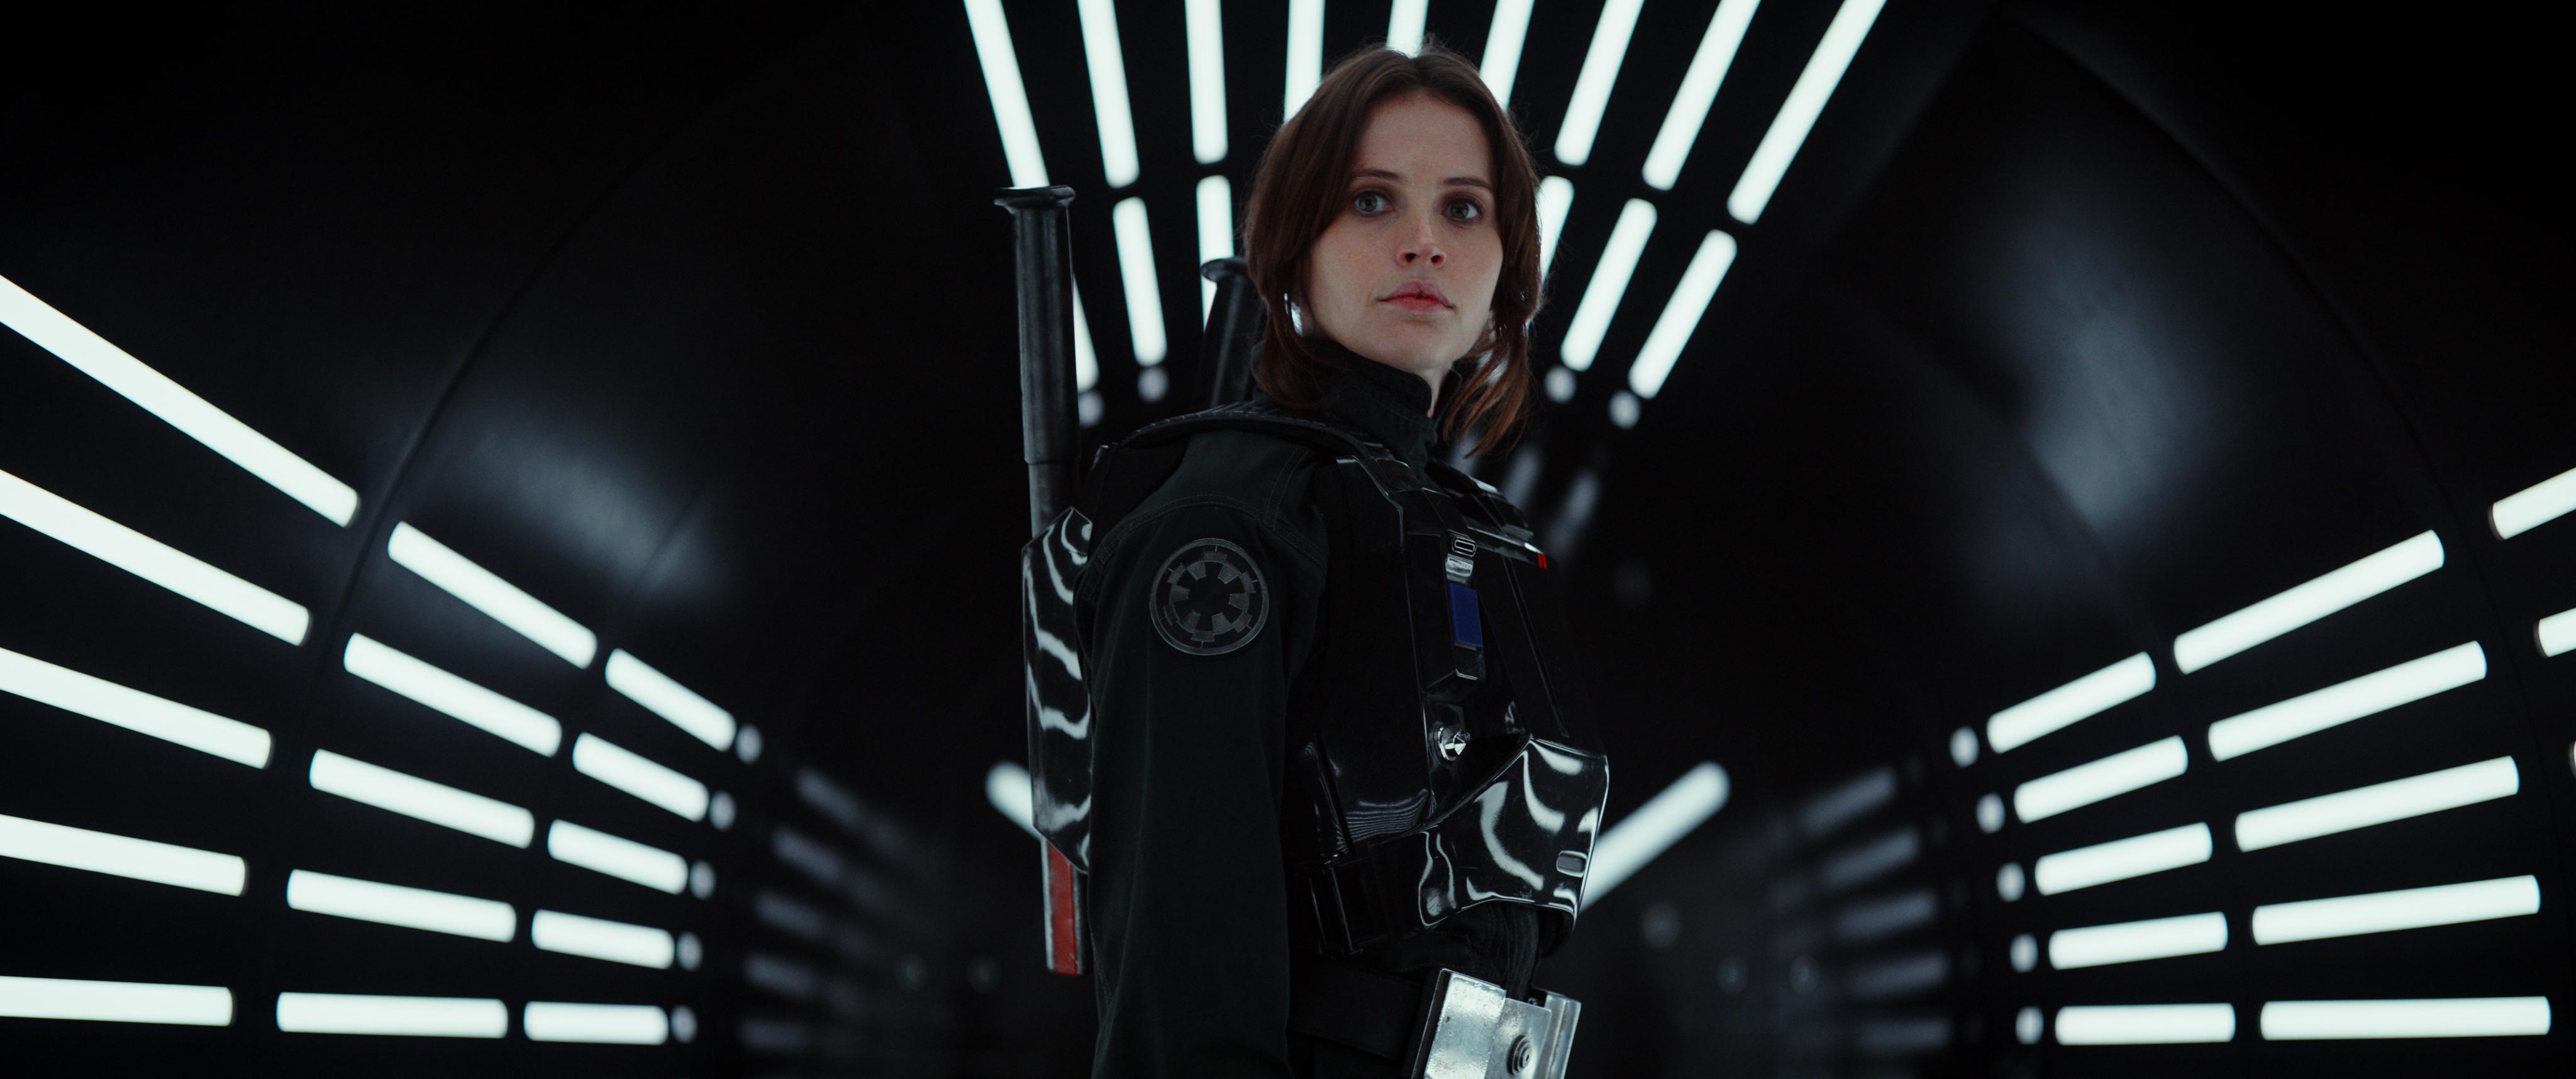 Rogue One: A Star Wars Story (Felicity Jones) Ph: Film Frame ©Lucasfilm LFL